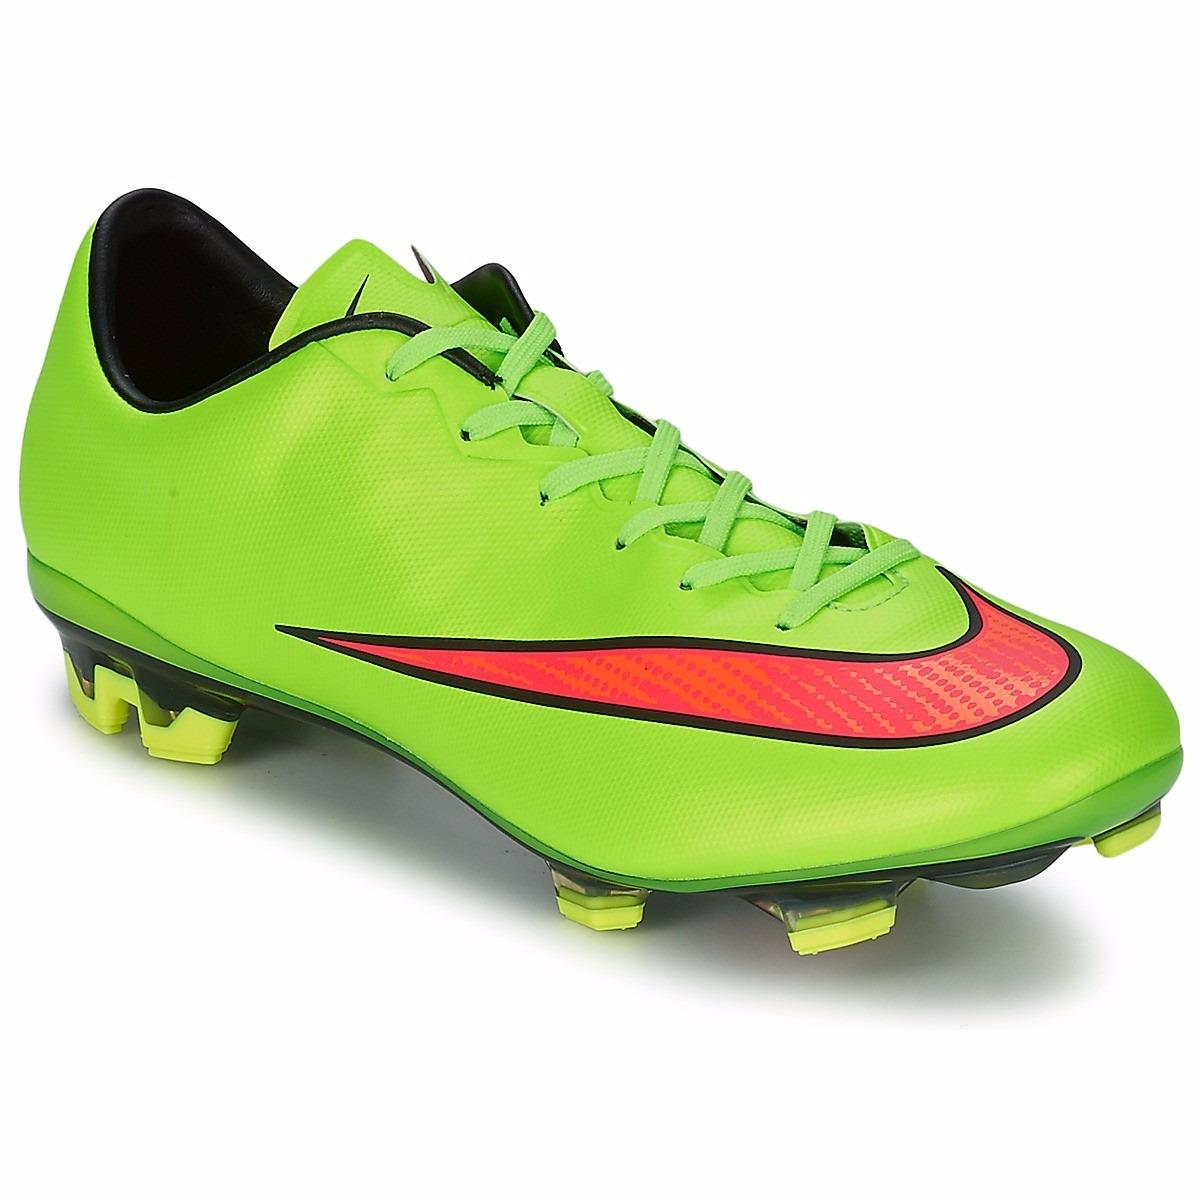 Chuteira Nike Mercurial Veloce 2 Fg Pro - De R  499 04961e36d76a6